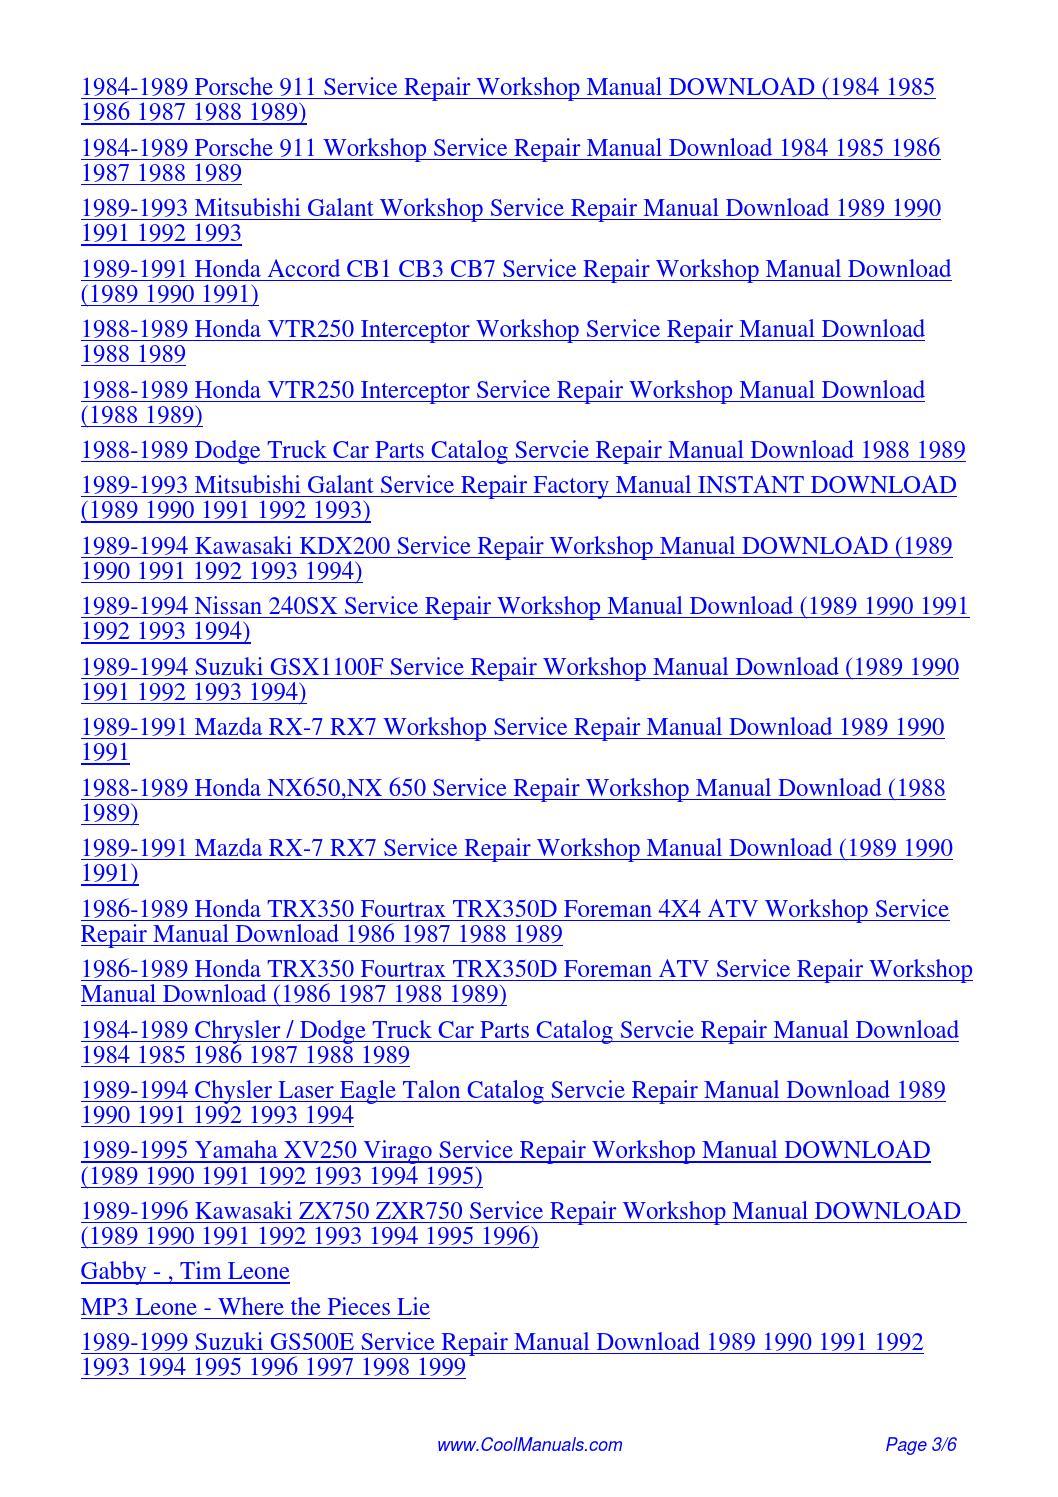 1989 Subaru Loyale Leone Ea82 Service Repair Manual Pdf By border=